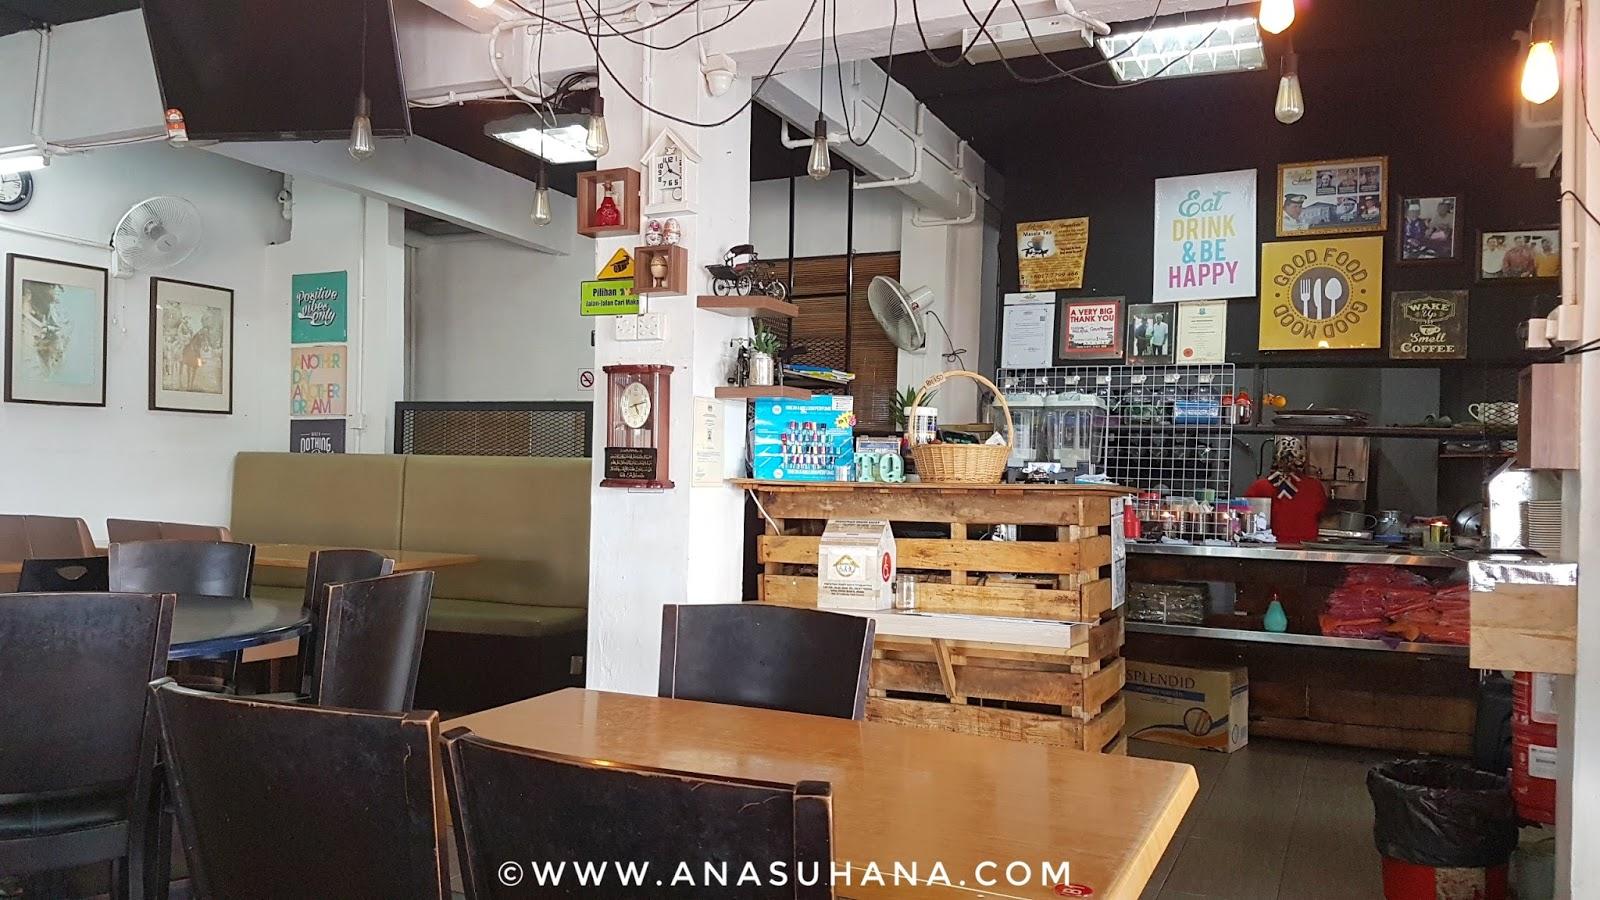 Restoran Kacang Pool Haji Larkin